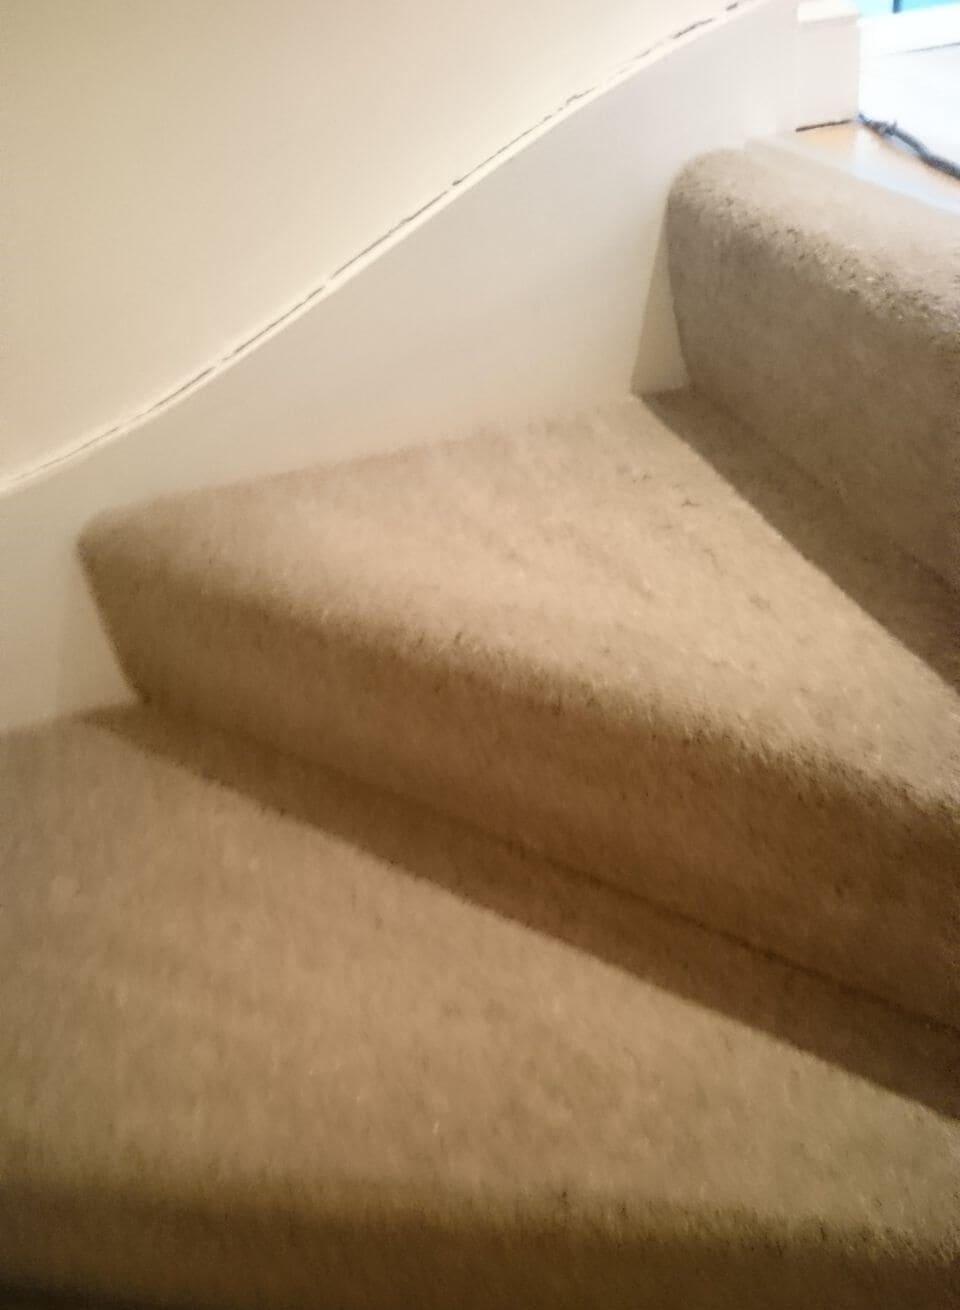 hire a carpet cleaner CR0